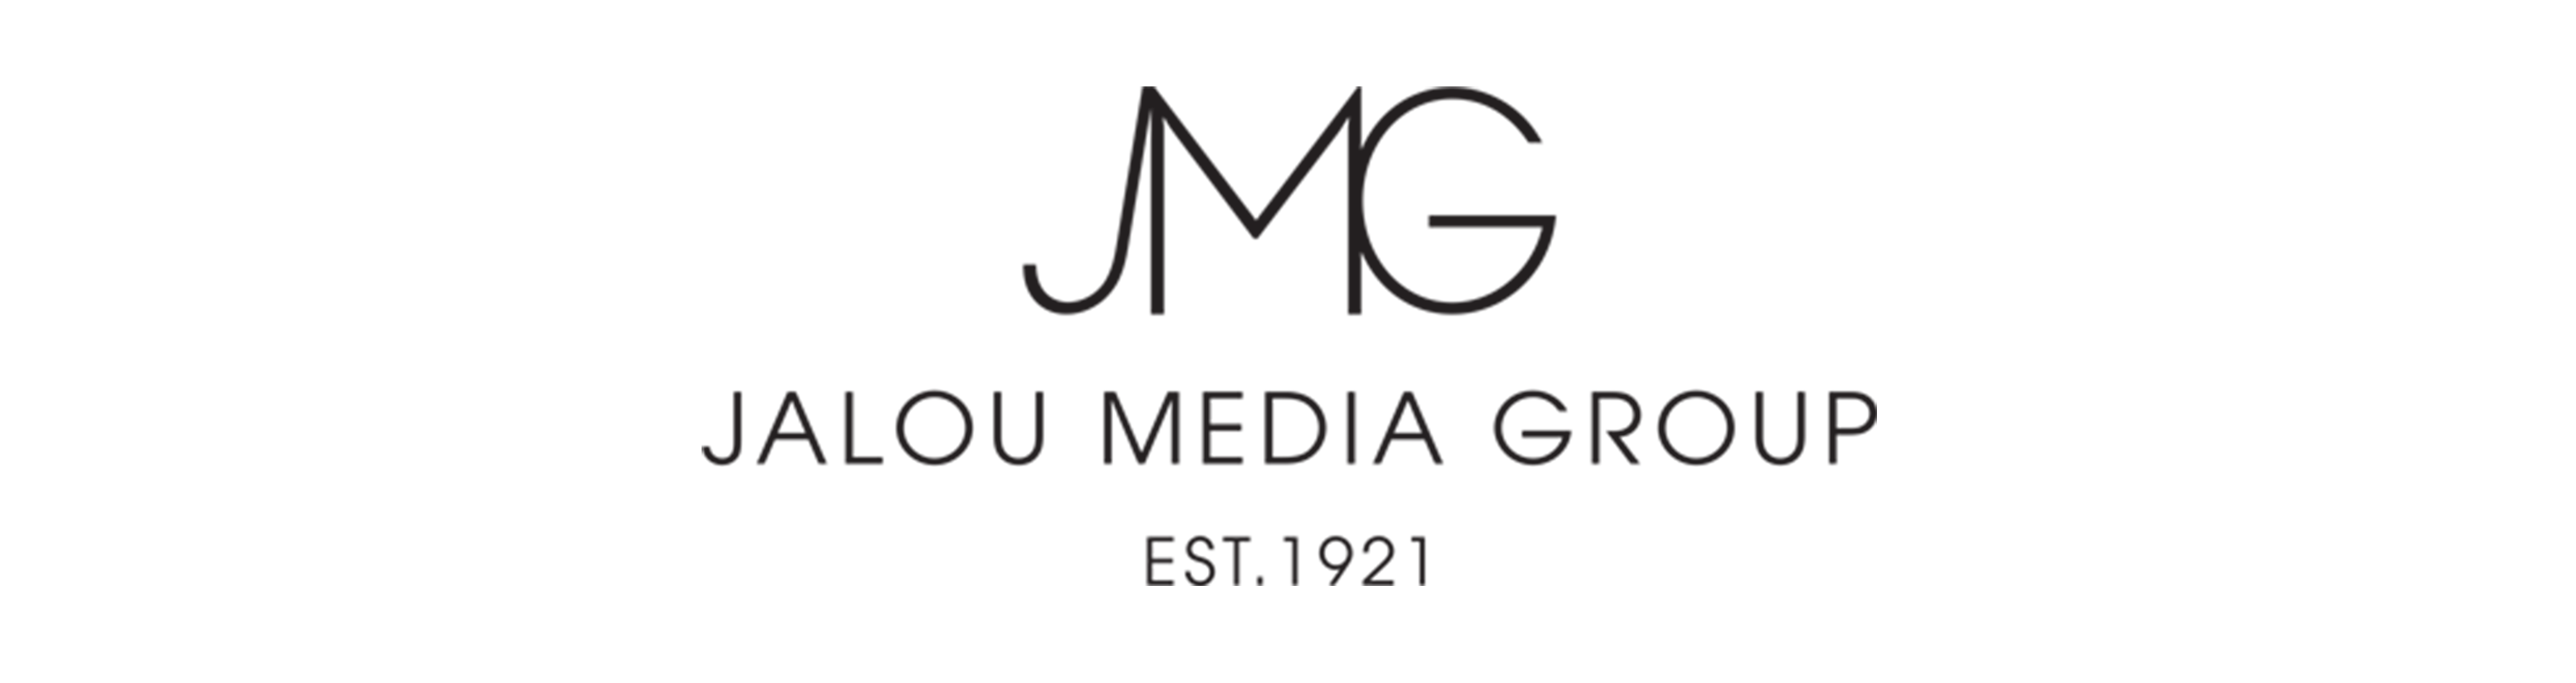 Jalou Media Group retient SPOKE !